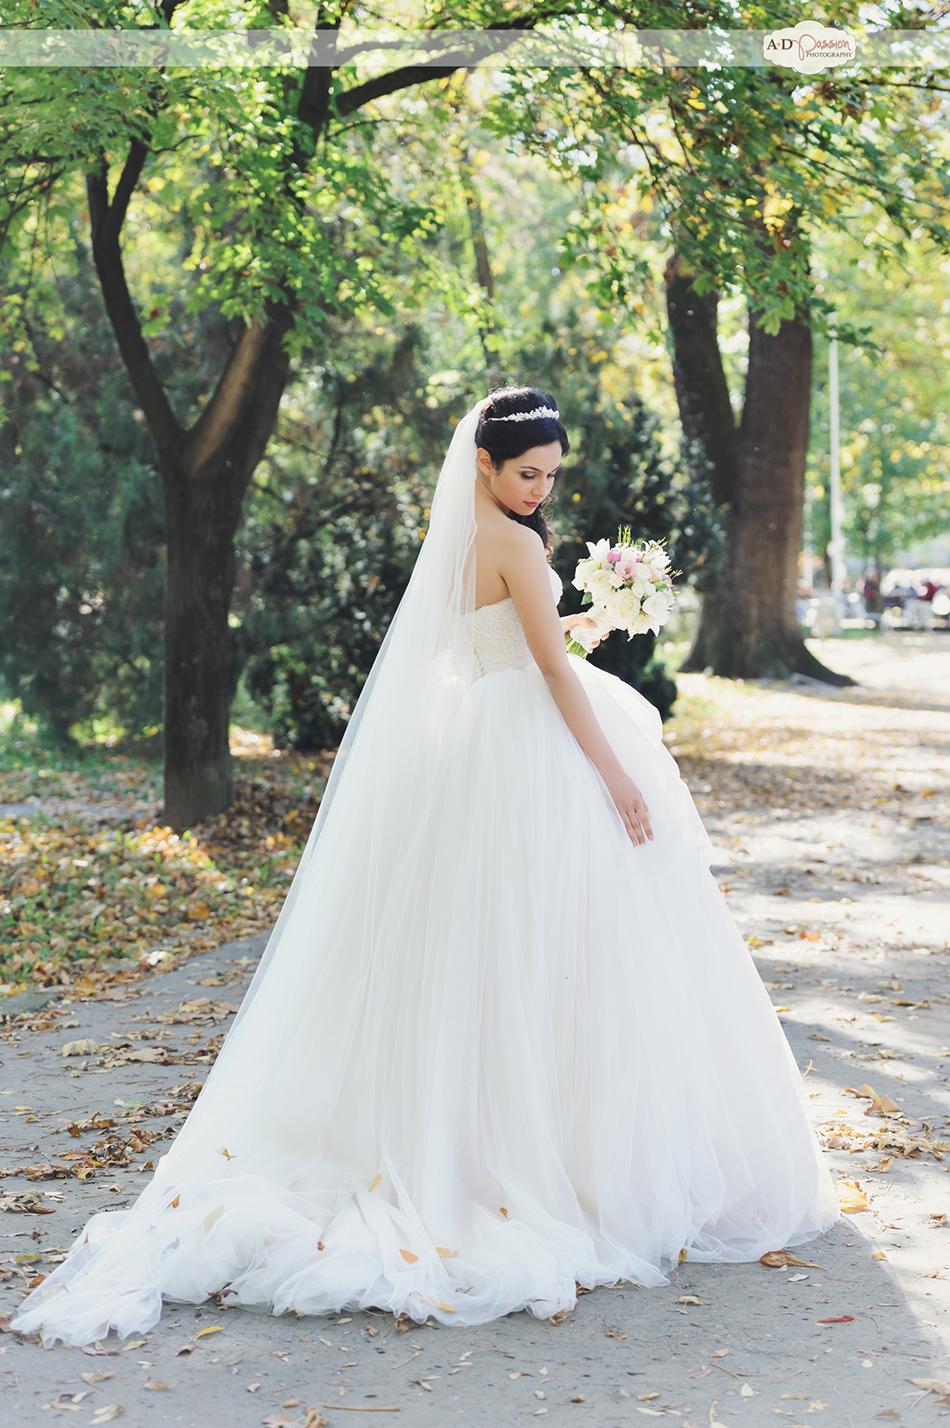 AD Passion Photography | fotograf-profesionist-de-nunta-arad-timisoara-bucuresti_madalina+mihnea_0115 | Adelin, Dida, fotograf profesionist, fotograf de nunta, fotografie de nunta, fotograf Timisoara, fotograf Craiova, fotograf Bucuresti, fotograf Arad, nunta Timisoara, nunta Arad, nunta Bucuresti, nunta Craiova